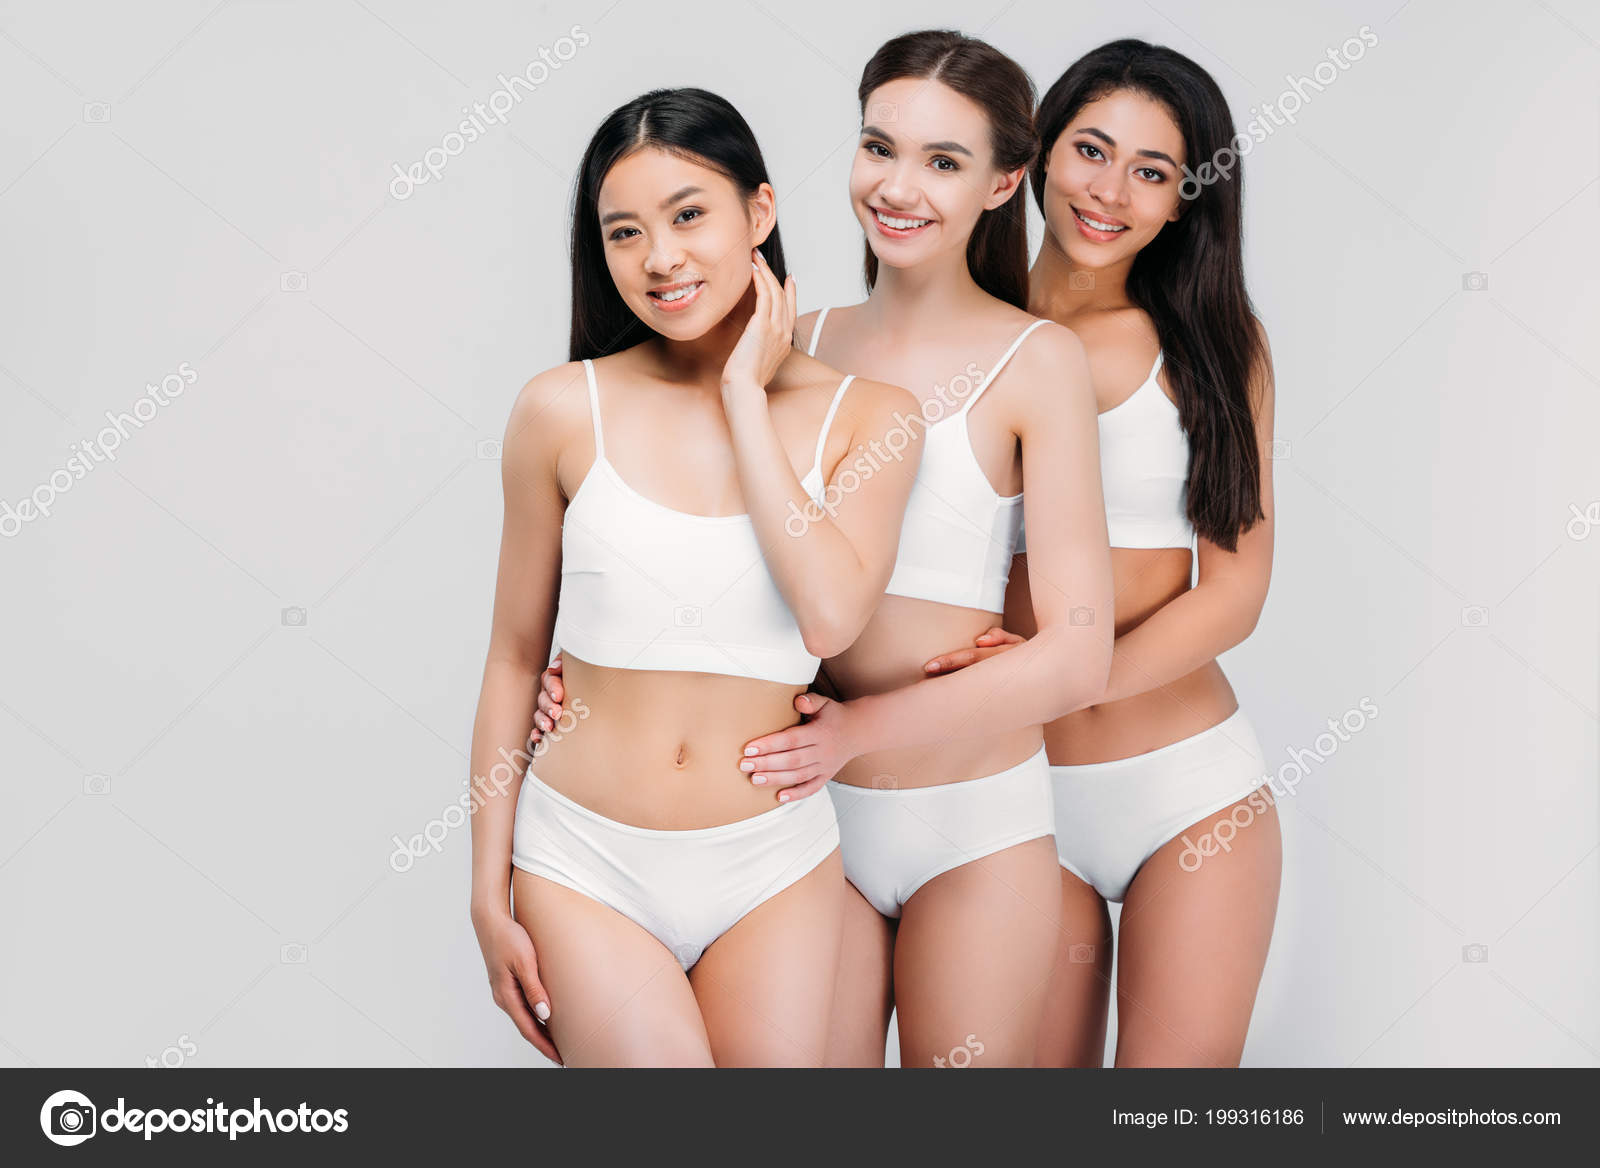 5b48194edb3c Sonriendo Multiétnicas Chicas Abrazándose Posando Ropa Interior ...